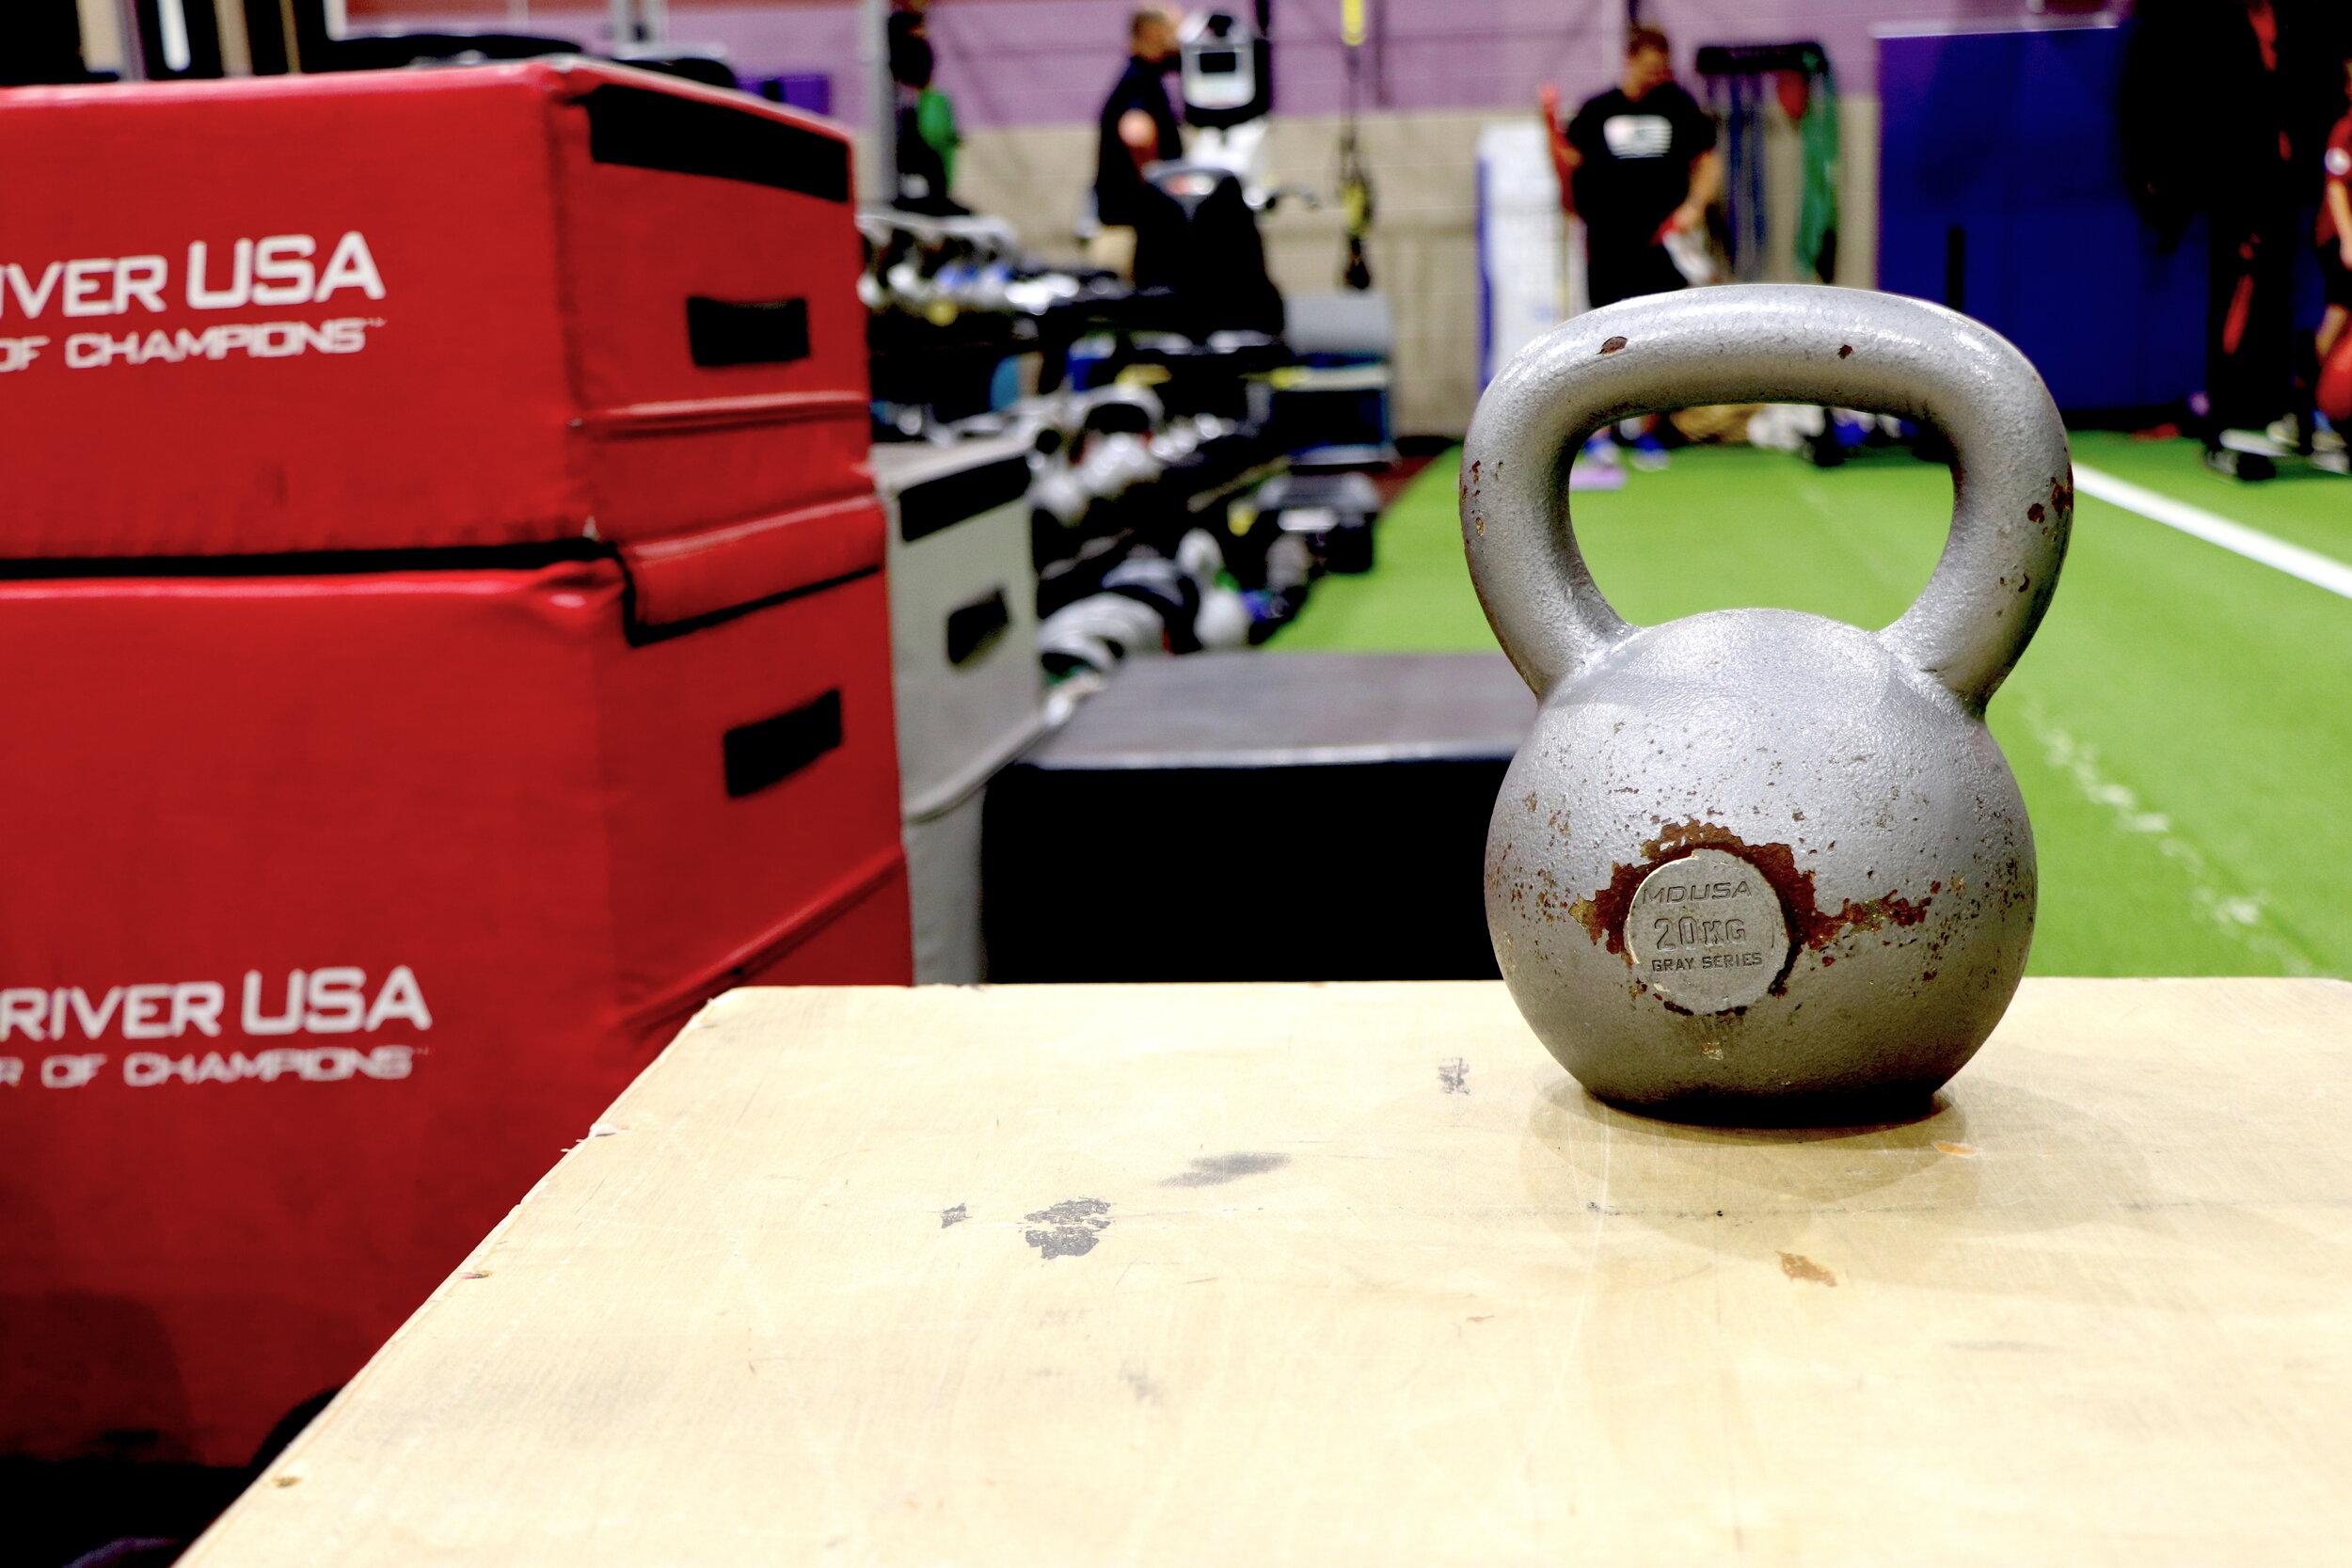 Ballantyne Athletic Training Center - Location: Morrison Family YMCA; 9405 Bryant Farms Road Charlotte, NC 28277